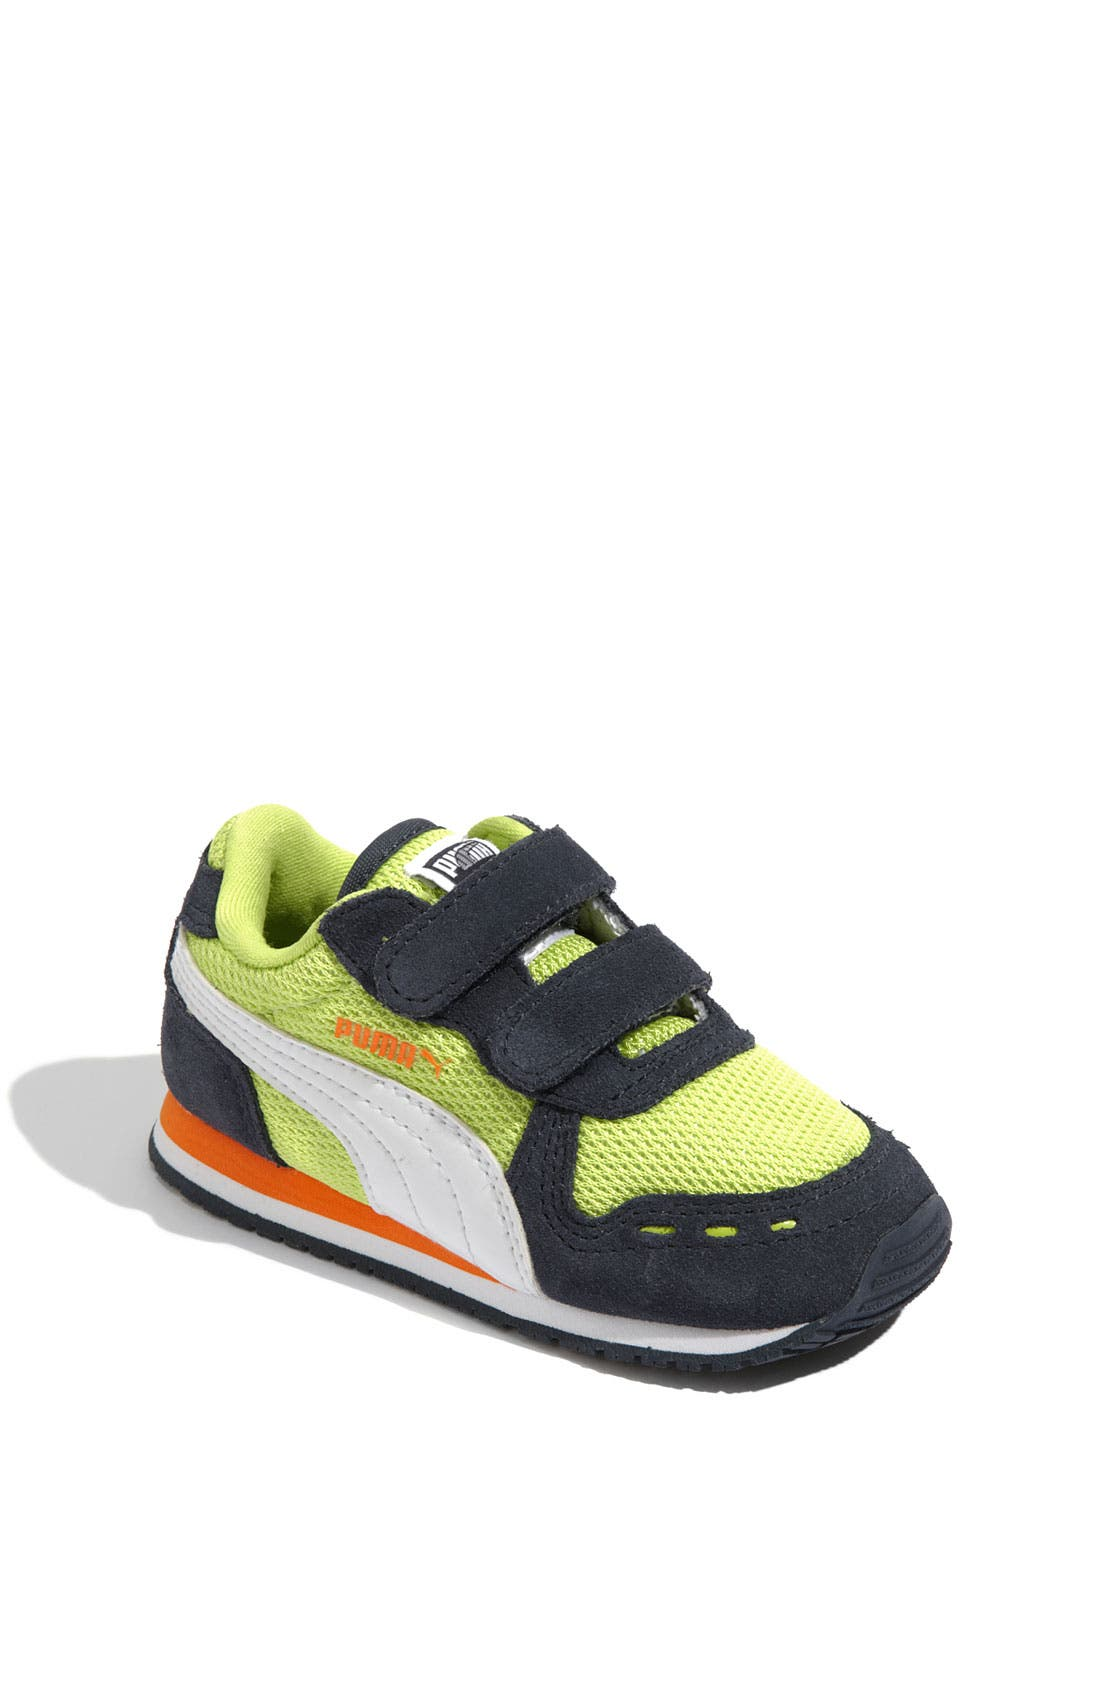 Main Image - PUMA 'Cabana Racer' Sneaker (Baby, Walker, Toddler & Little Kid)